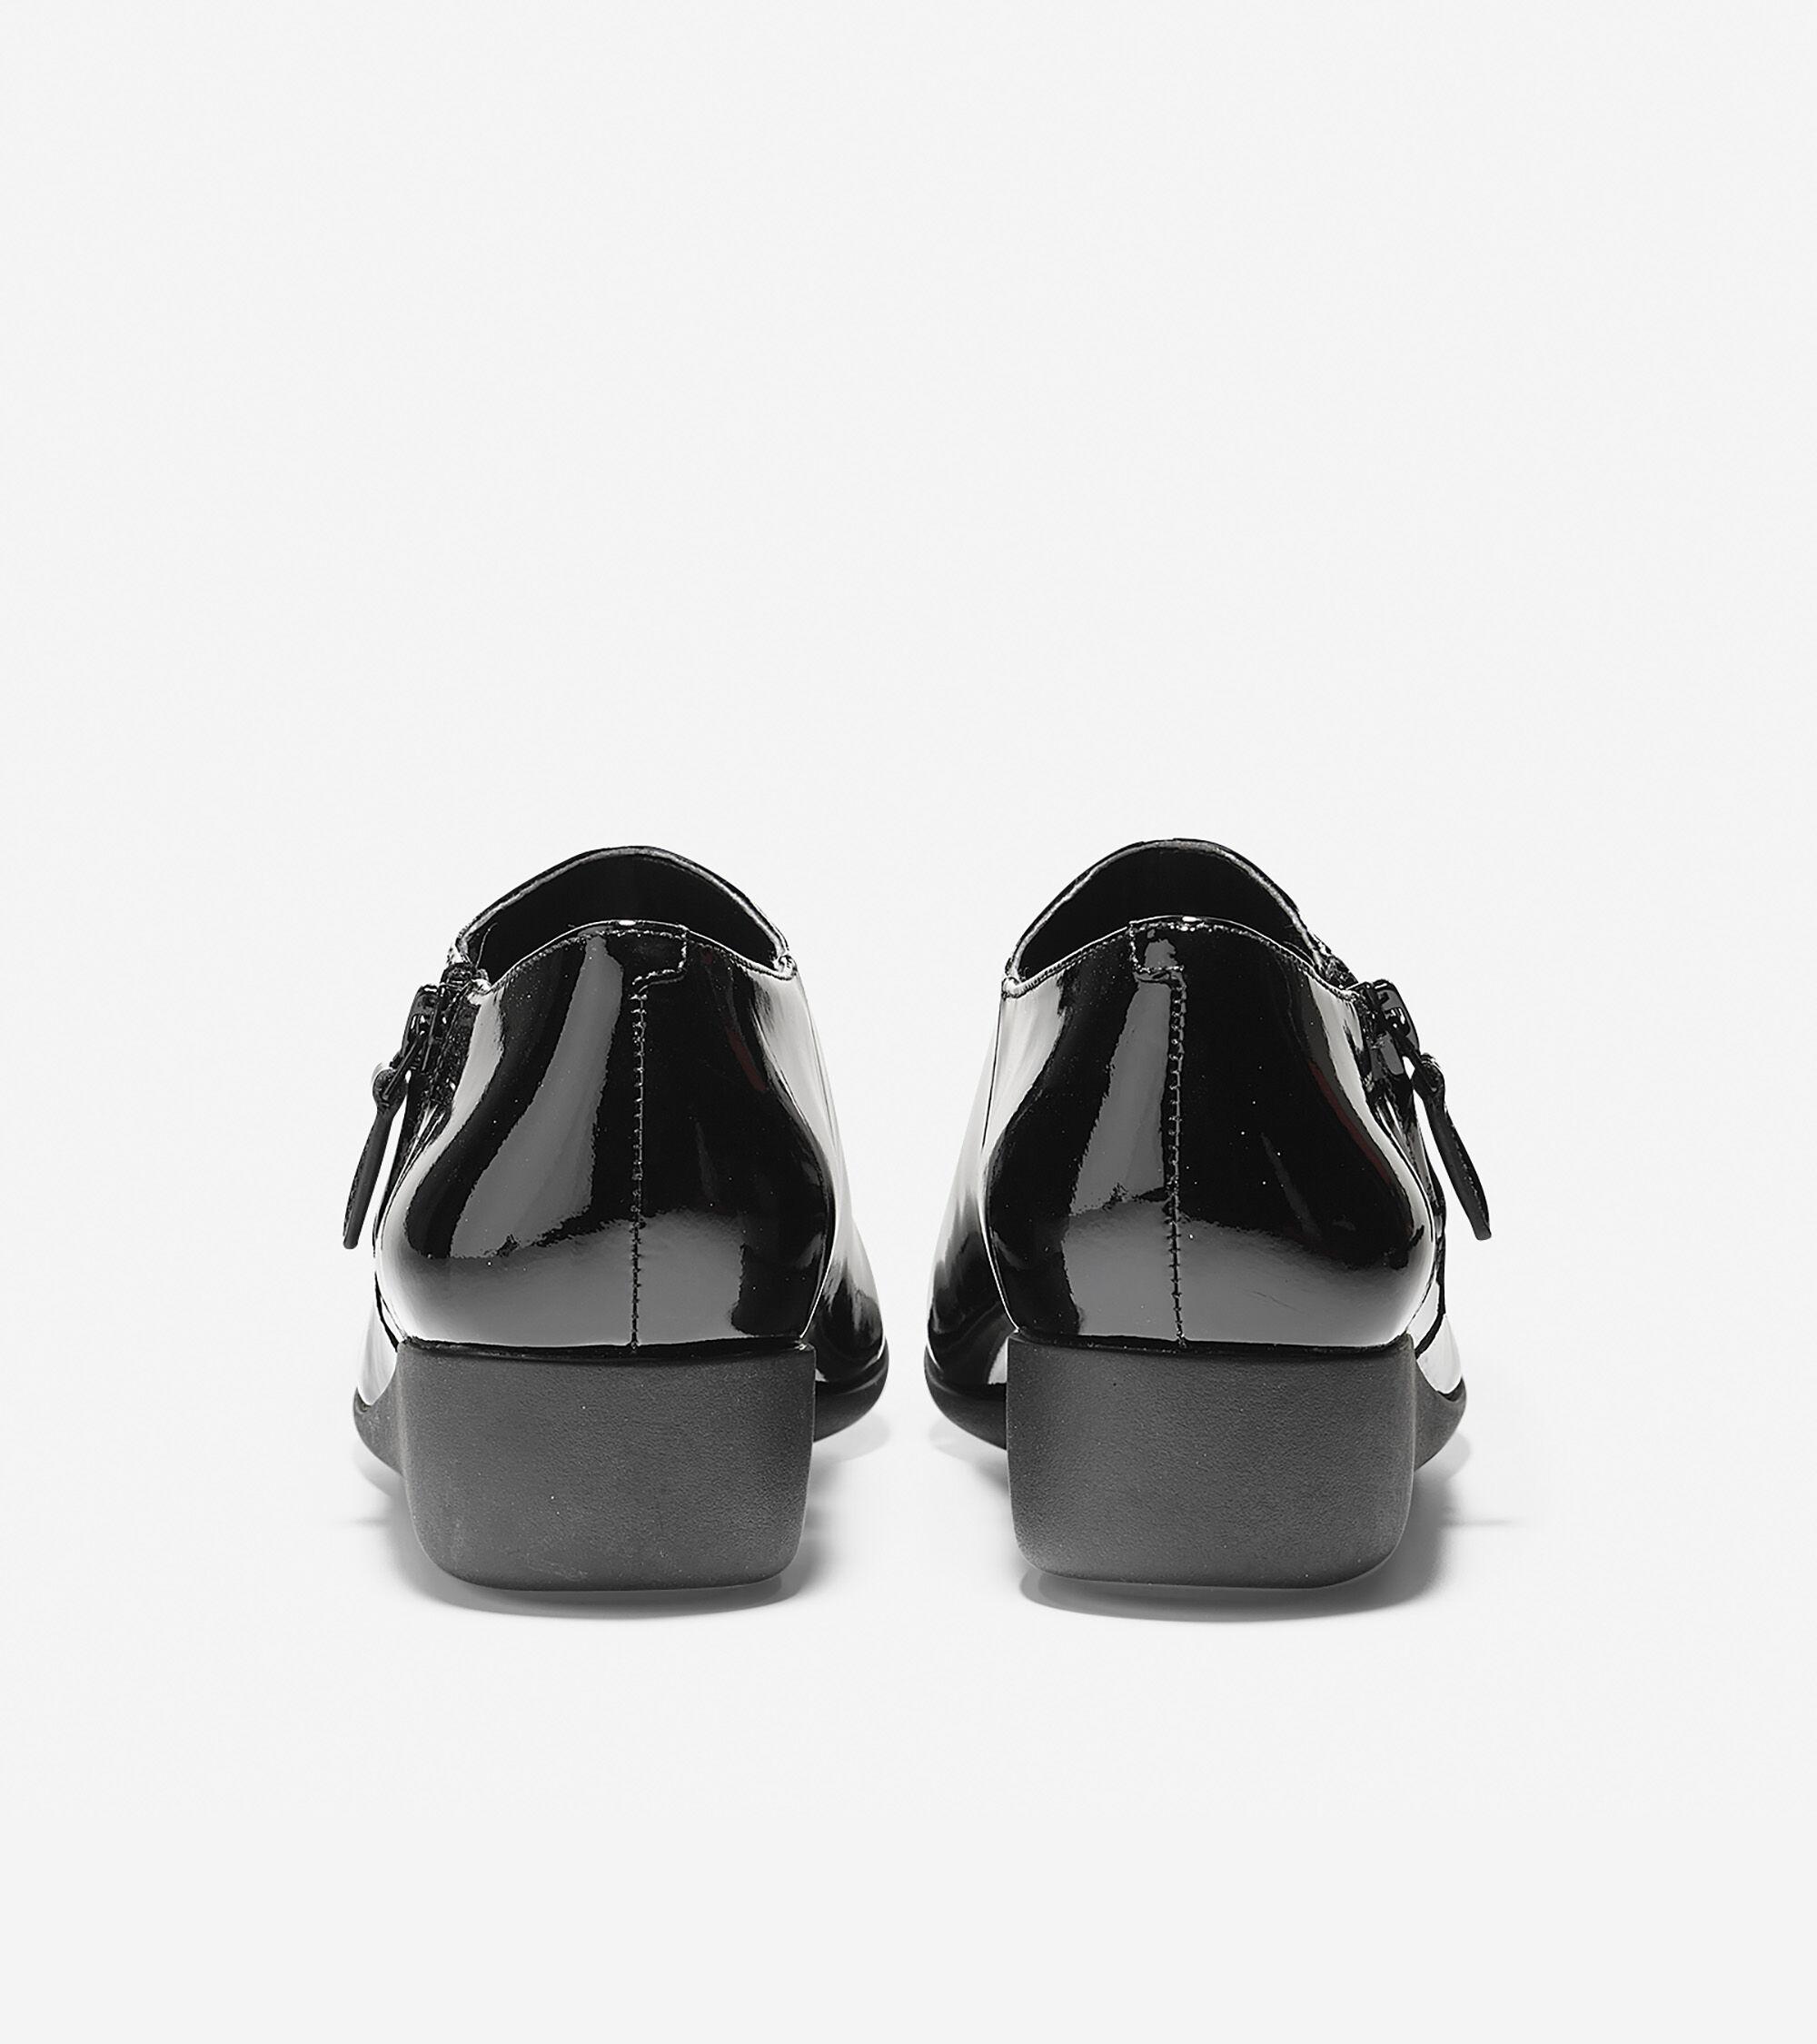 Callie Rain Shoe (30mm) in Black Patent